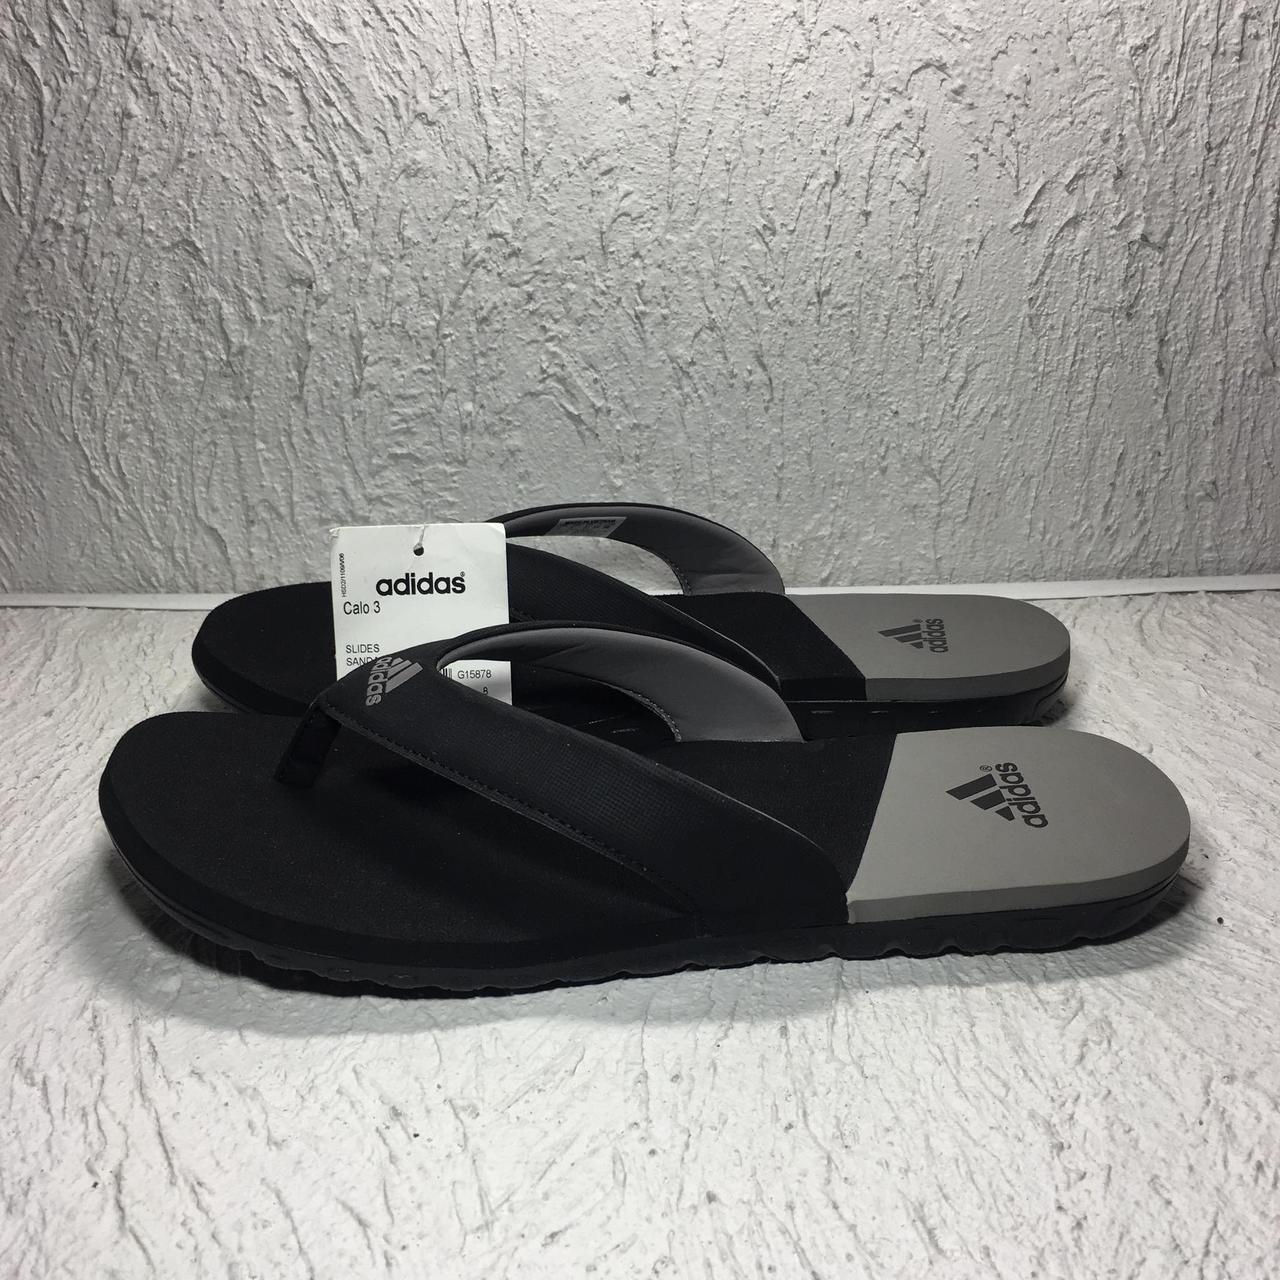 Вьетнамки Adidas Calo 3 M G15878 40 1/2; 42 размер